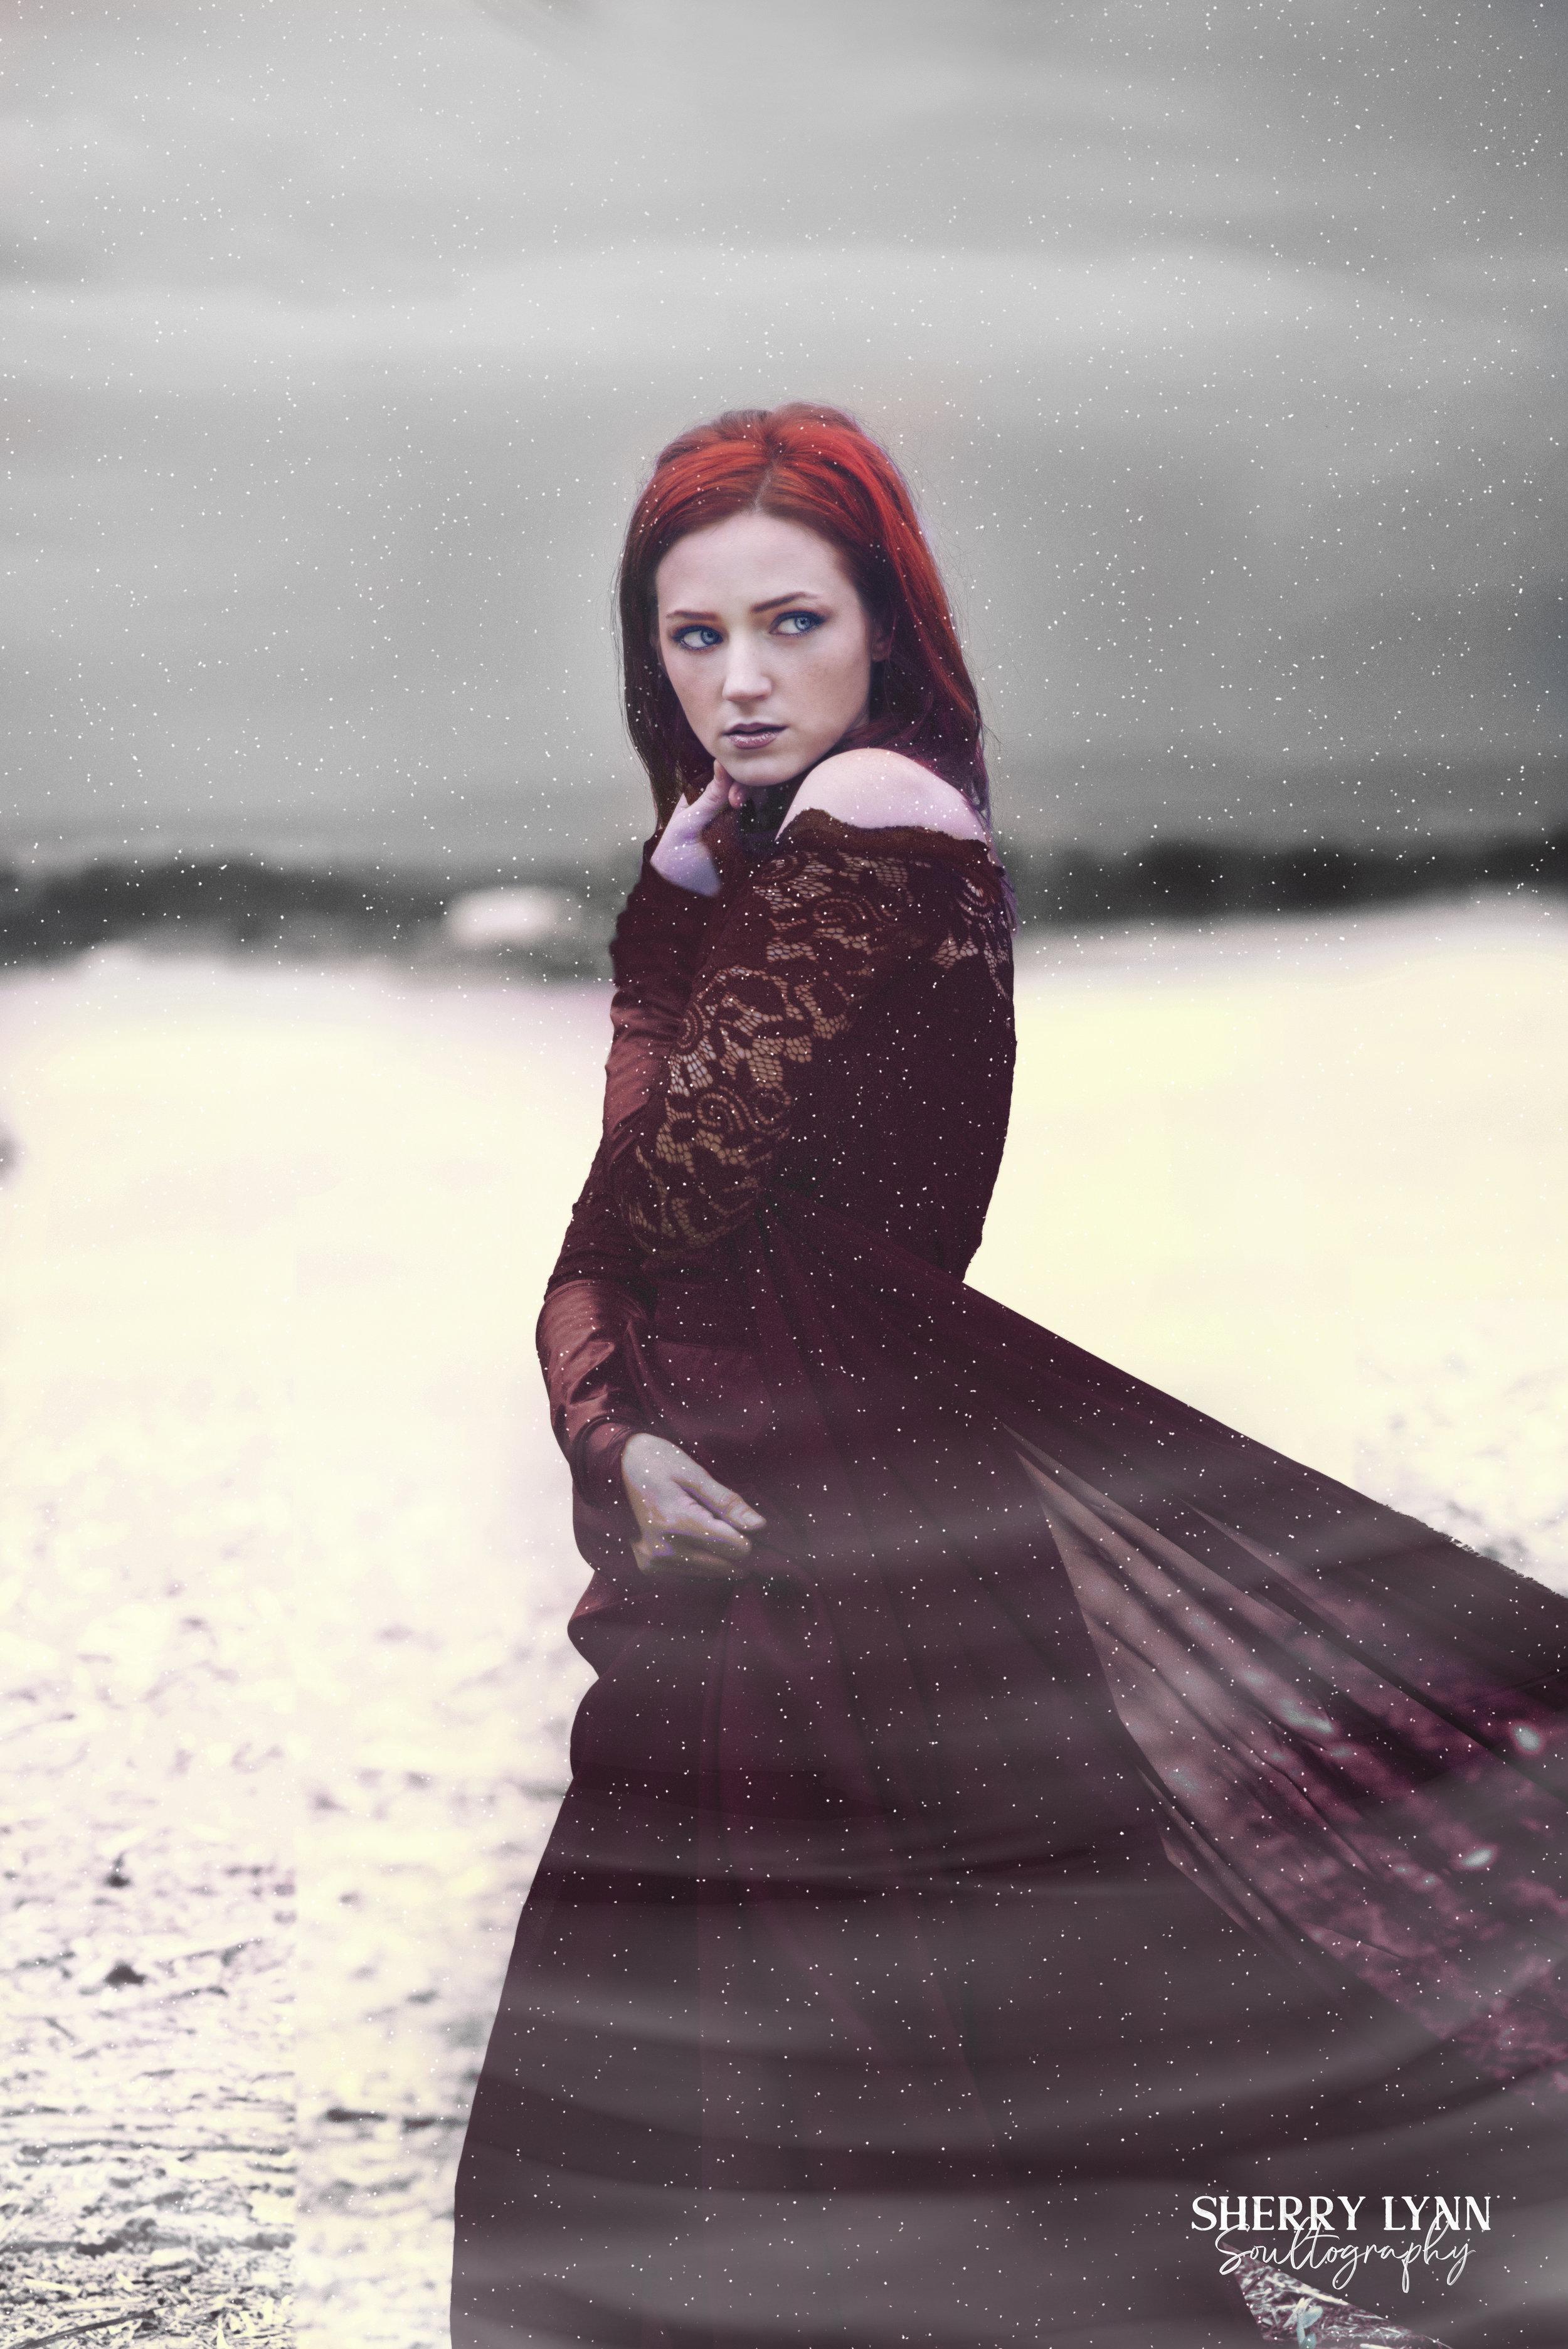 Lady in Red3fb.jpg